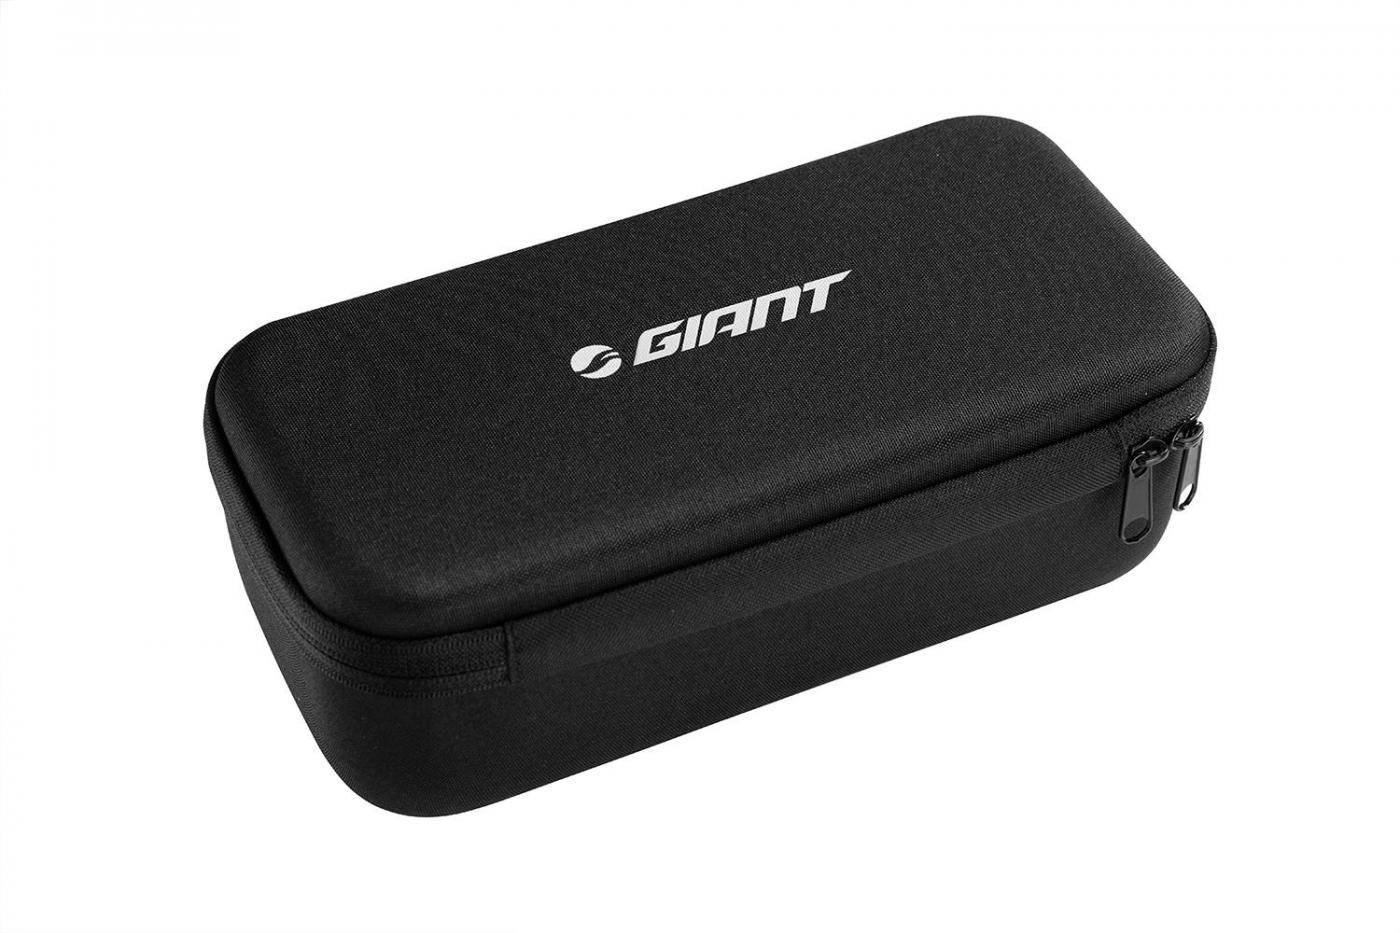 Torba zaštitna za punjač GIANT Smart 6A